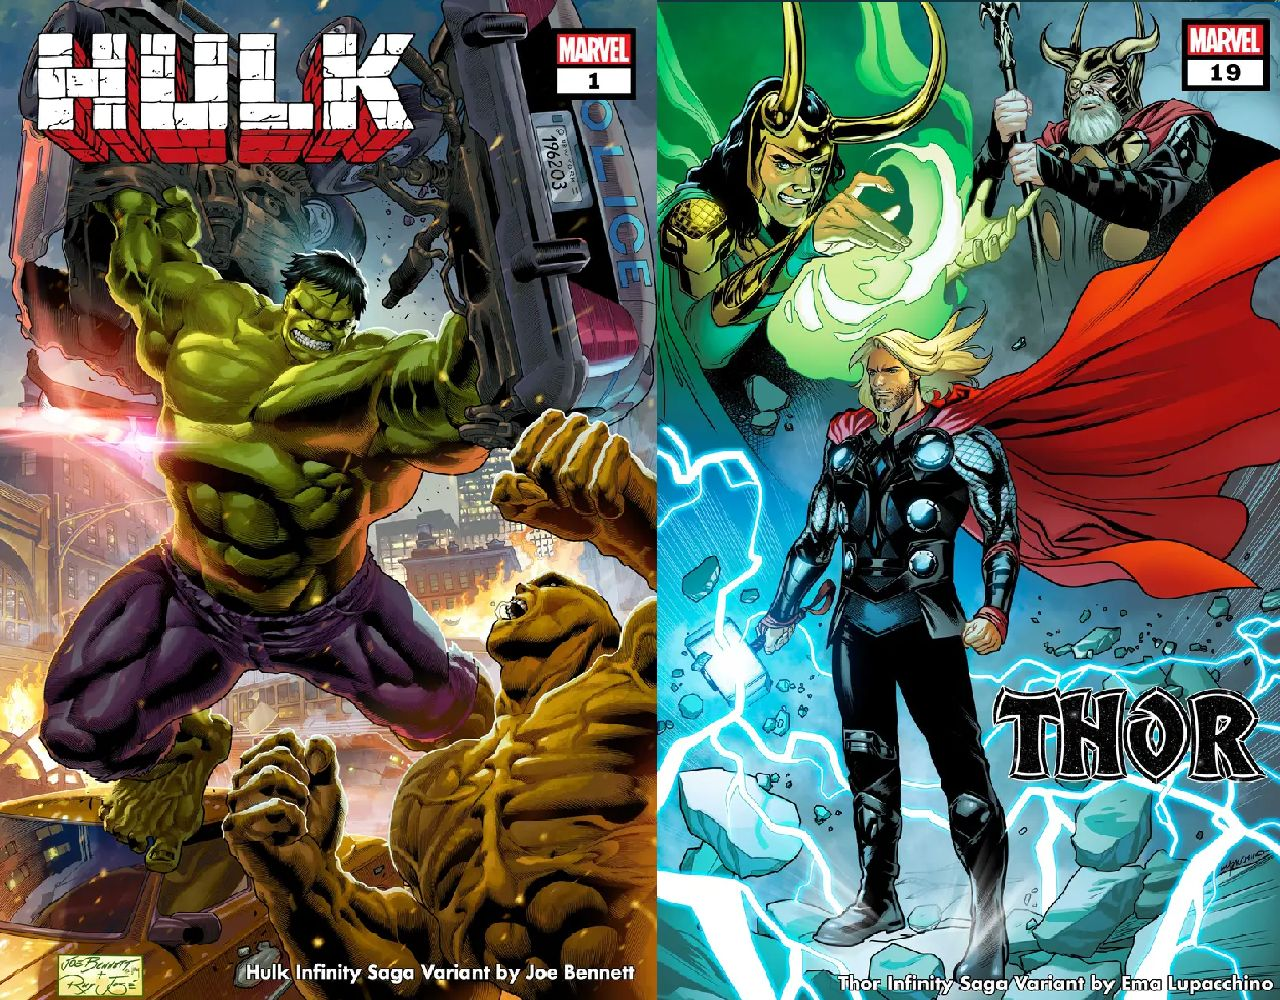 personajes de marvel hulk